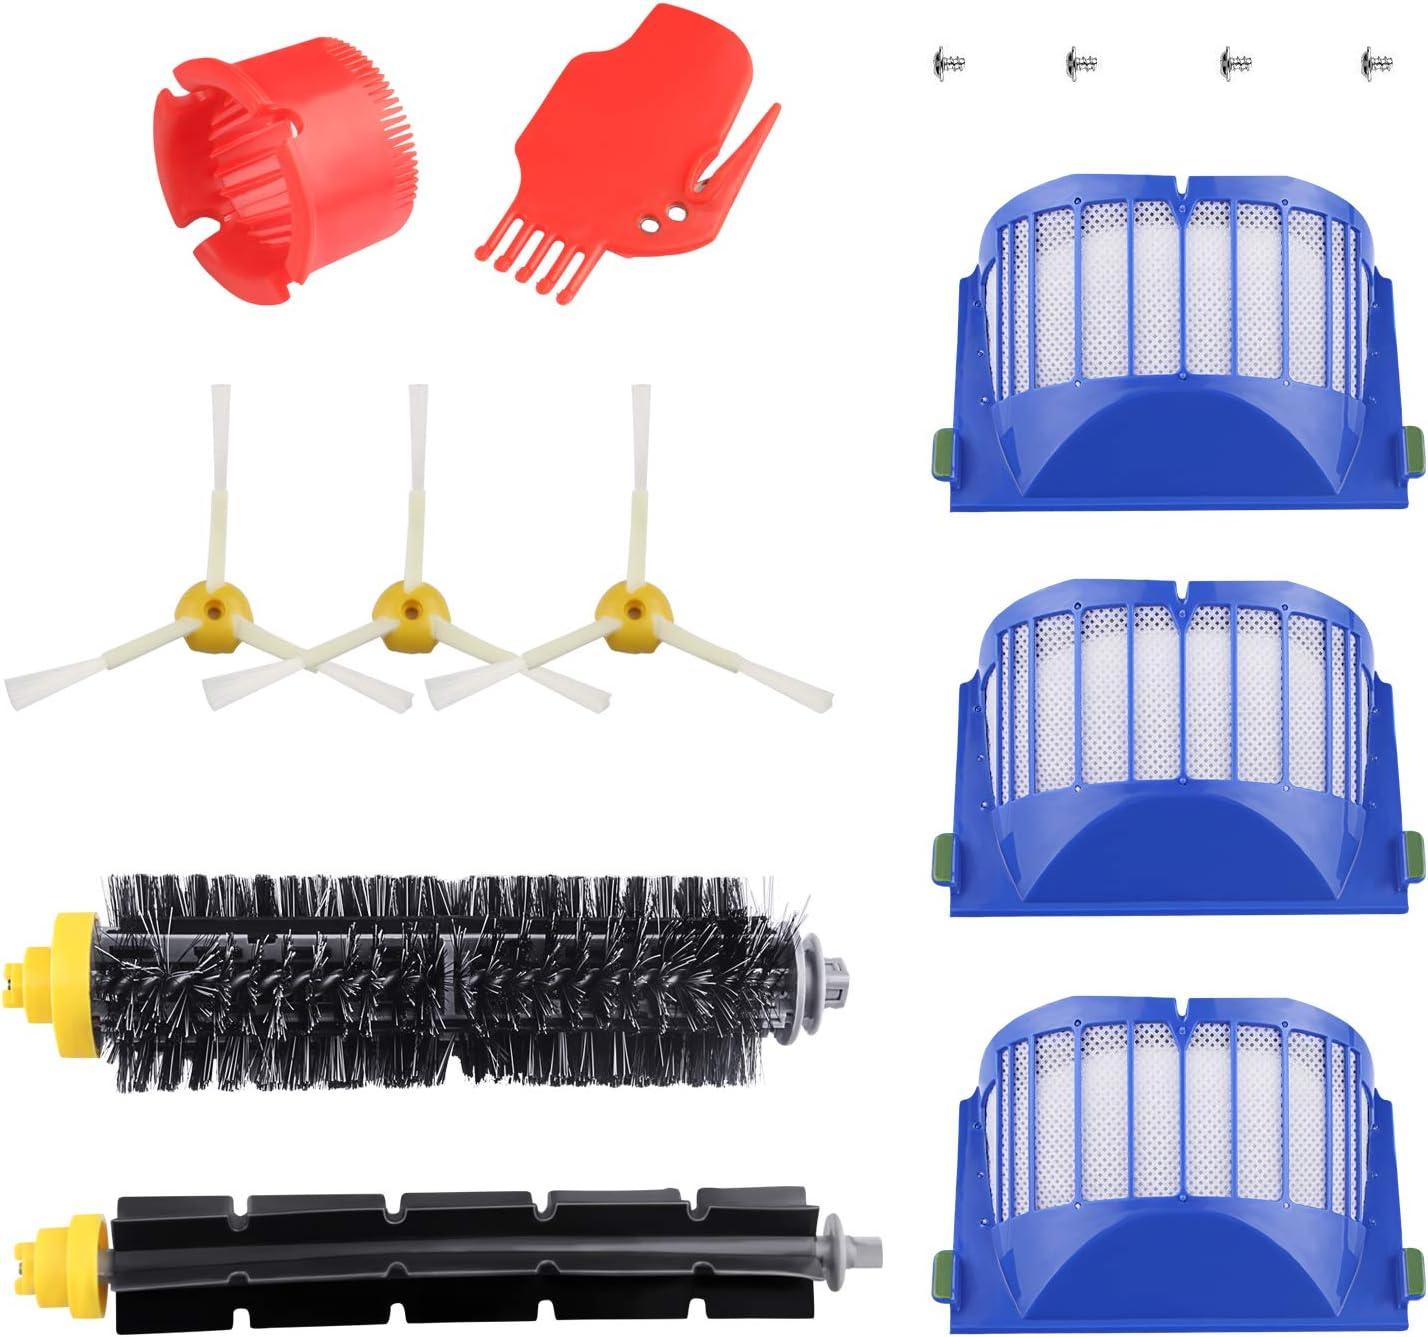 Repuesto para aspiradoras Irobot Roomba 500 600 610 620 650